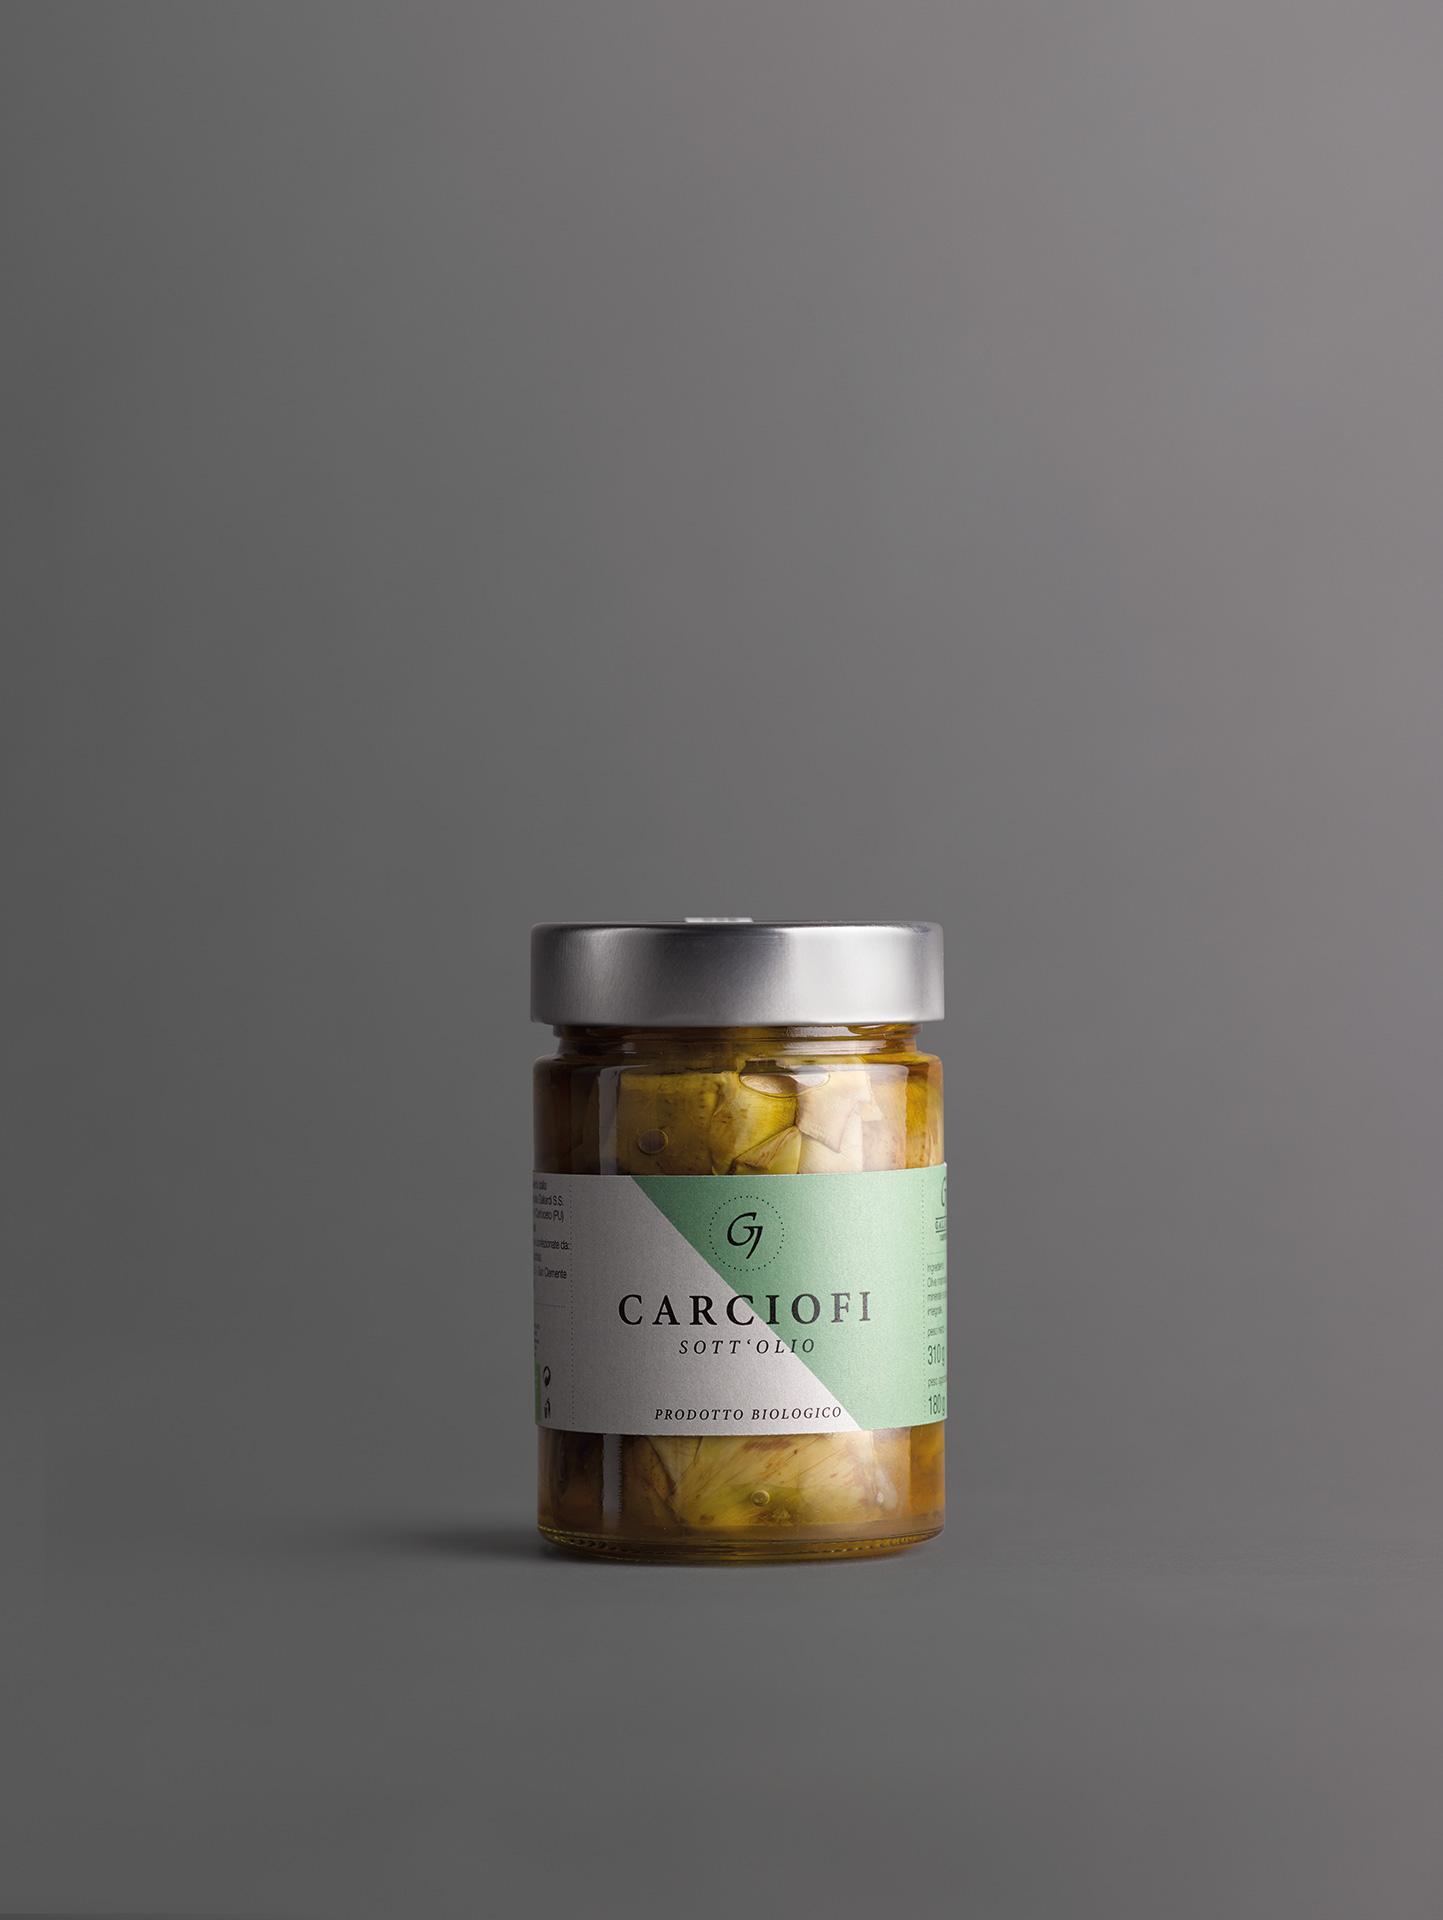 GALIARDI – Azienda Agricola Cartoceto – Carciofi sott'olio